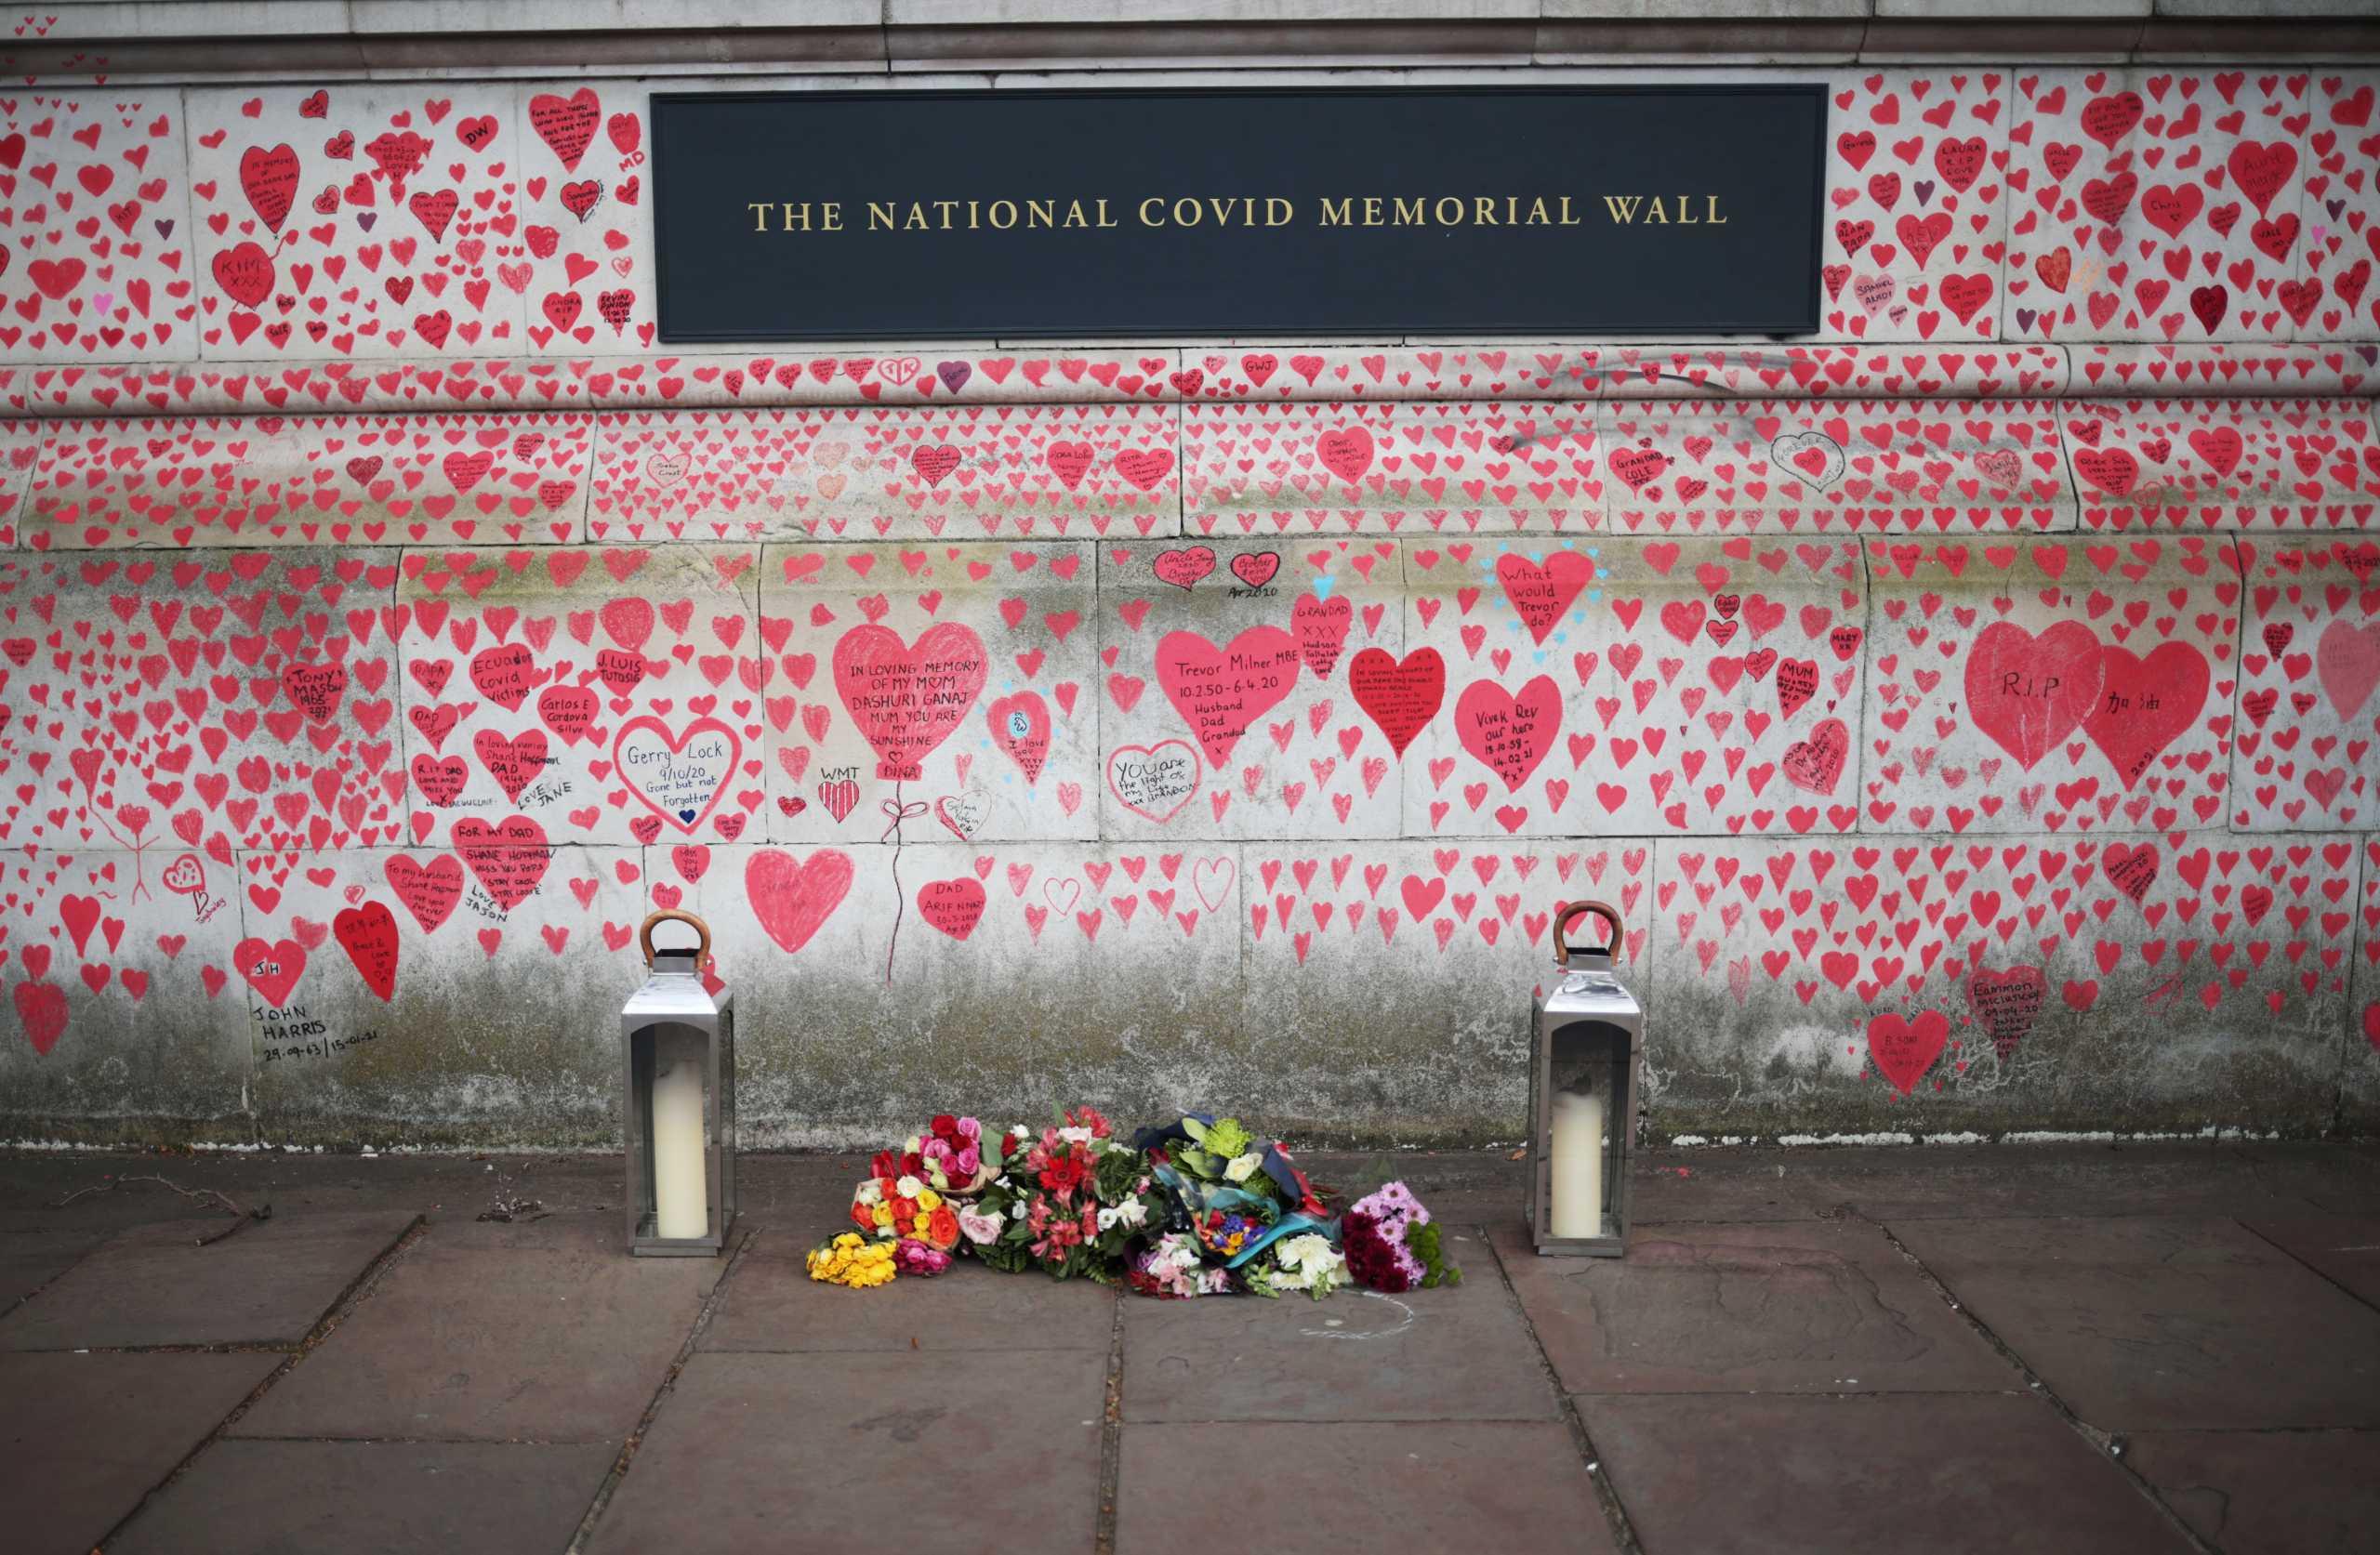 National Covid Memorial Wall: Το συγκινητικό μνημείο στο Λονδίνο για τα θύματα του κορονοϊού (pics)